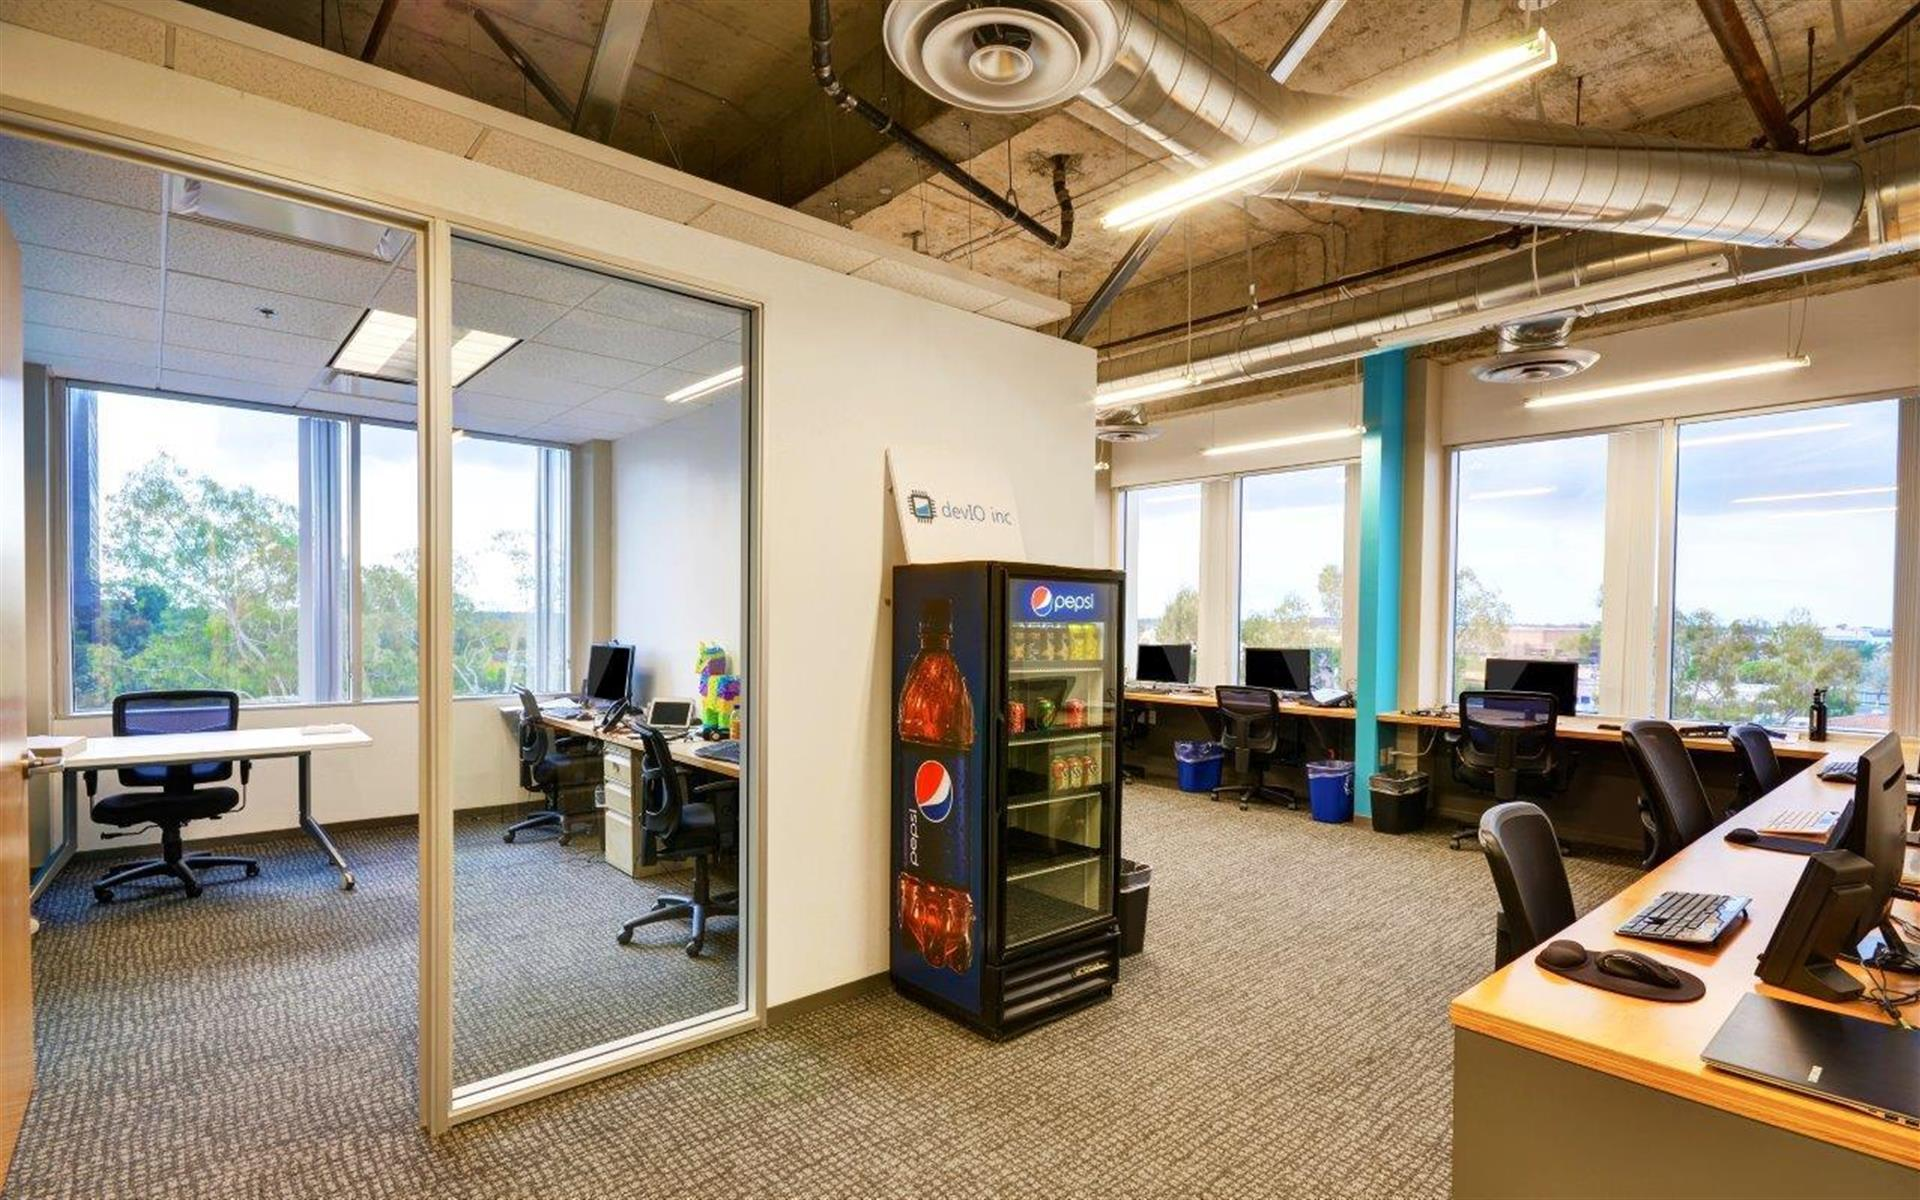 TechSpace - Costa Mesa - Team Space W/ Private office